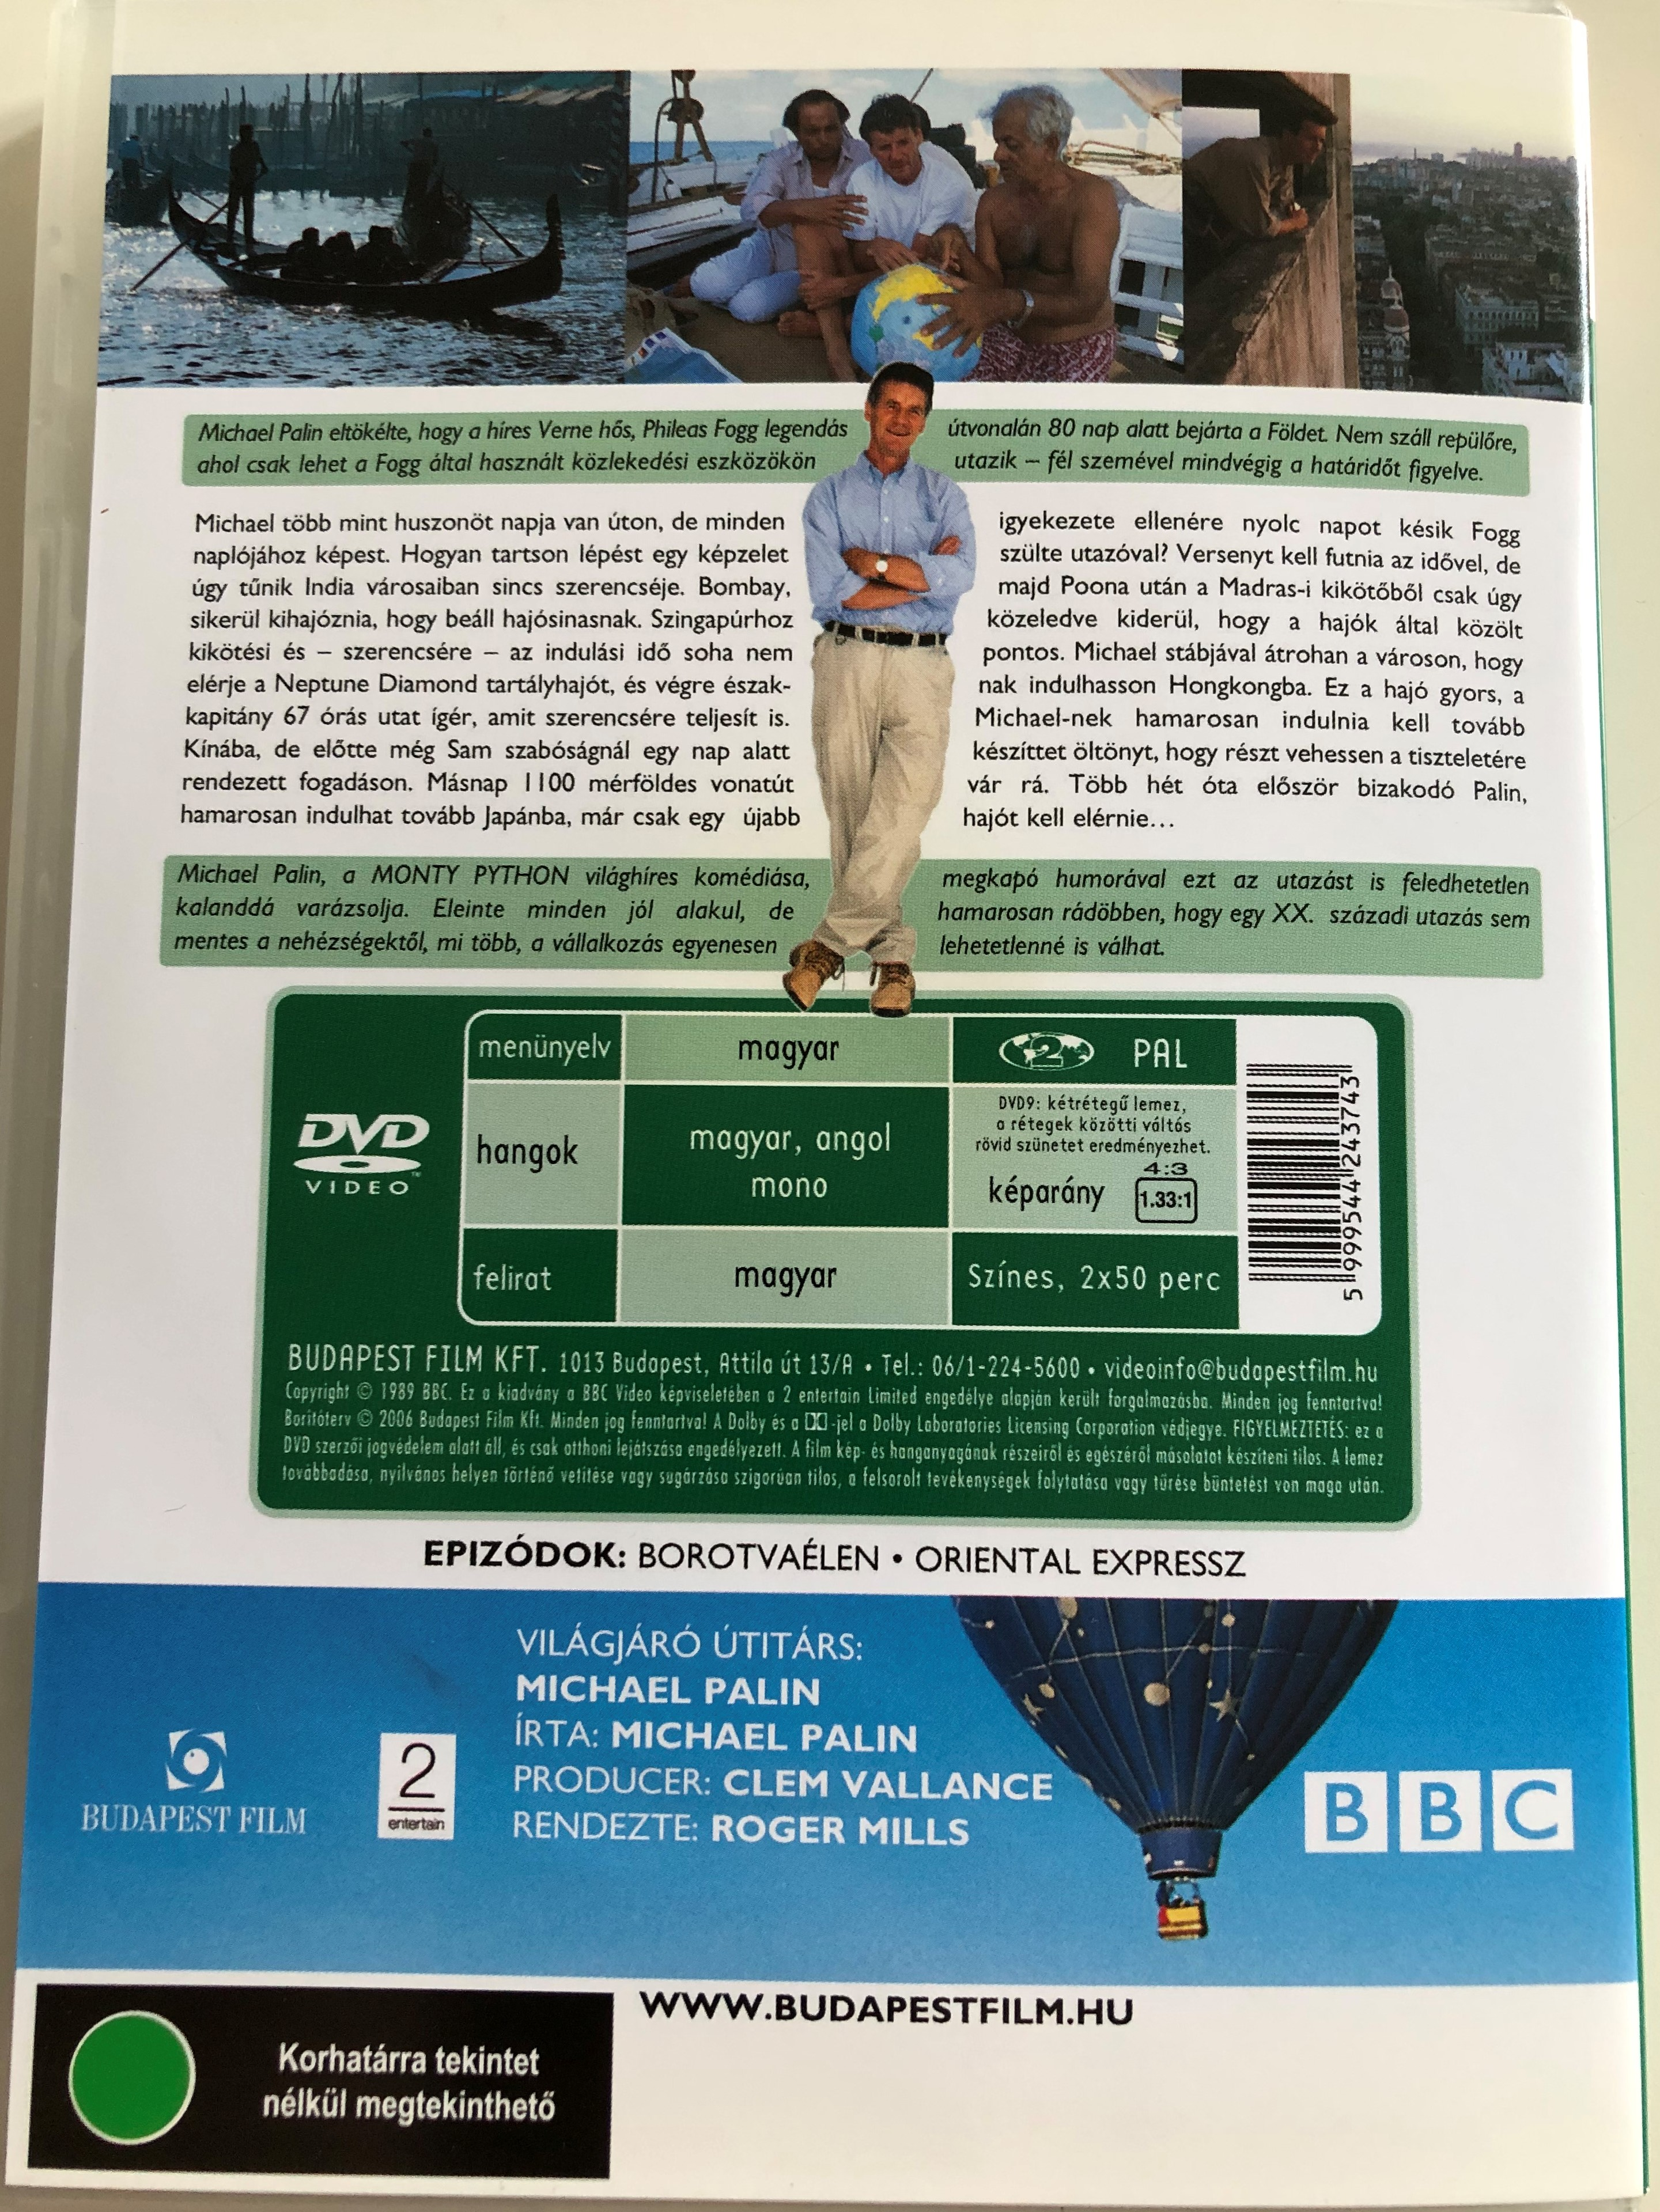 michael-palin-around-the-world-in-80-days-part-2.-dvd-1989-80-nap-alatt-a-f-ld-k-r-l-michael-palinnel-directed-by-roger-mills-bbc-episodes-a-close-shave-oriental-express-2-.jpg